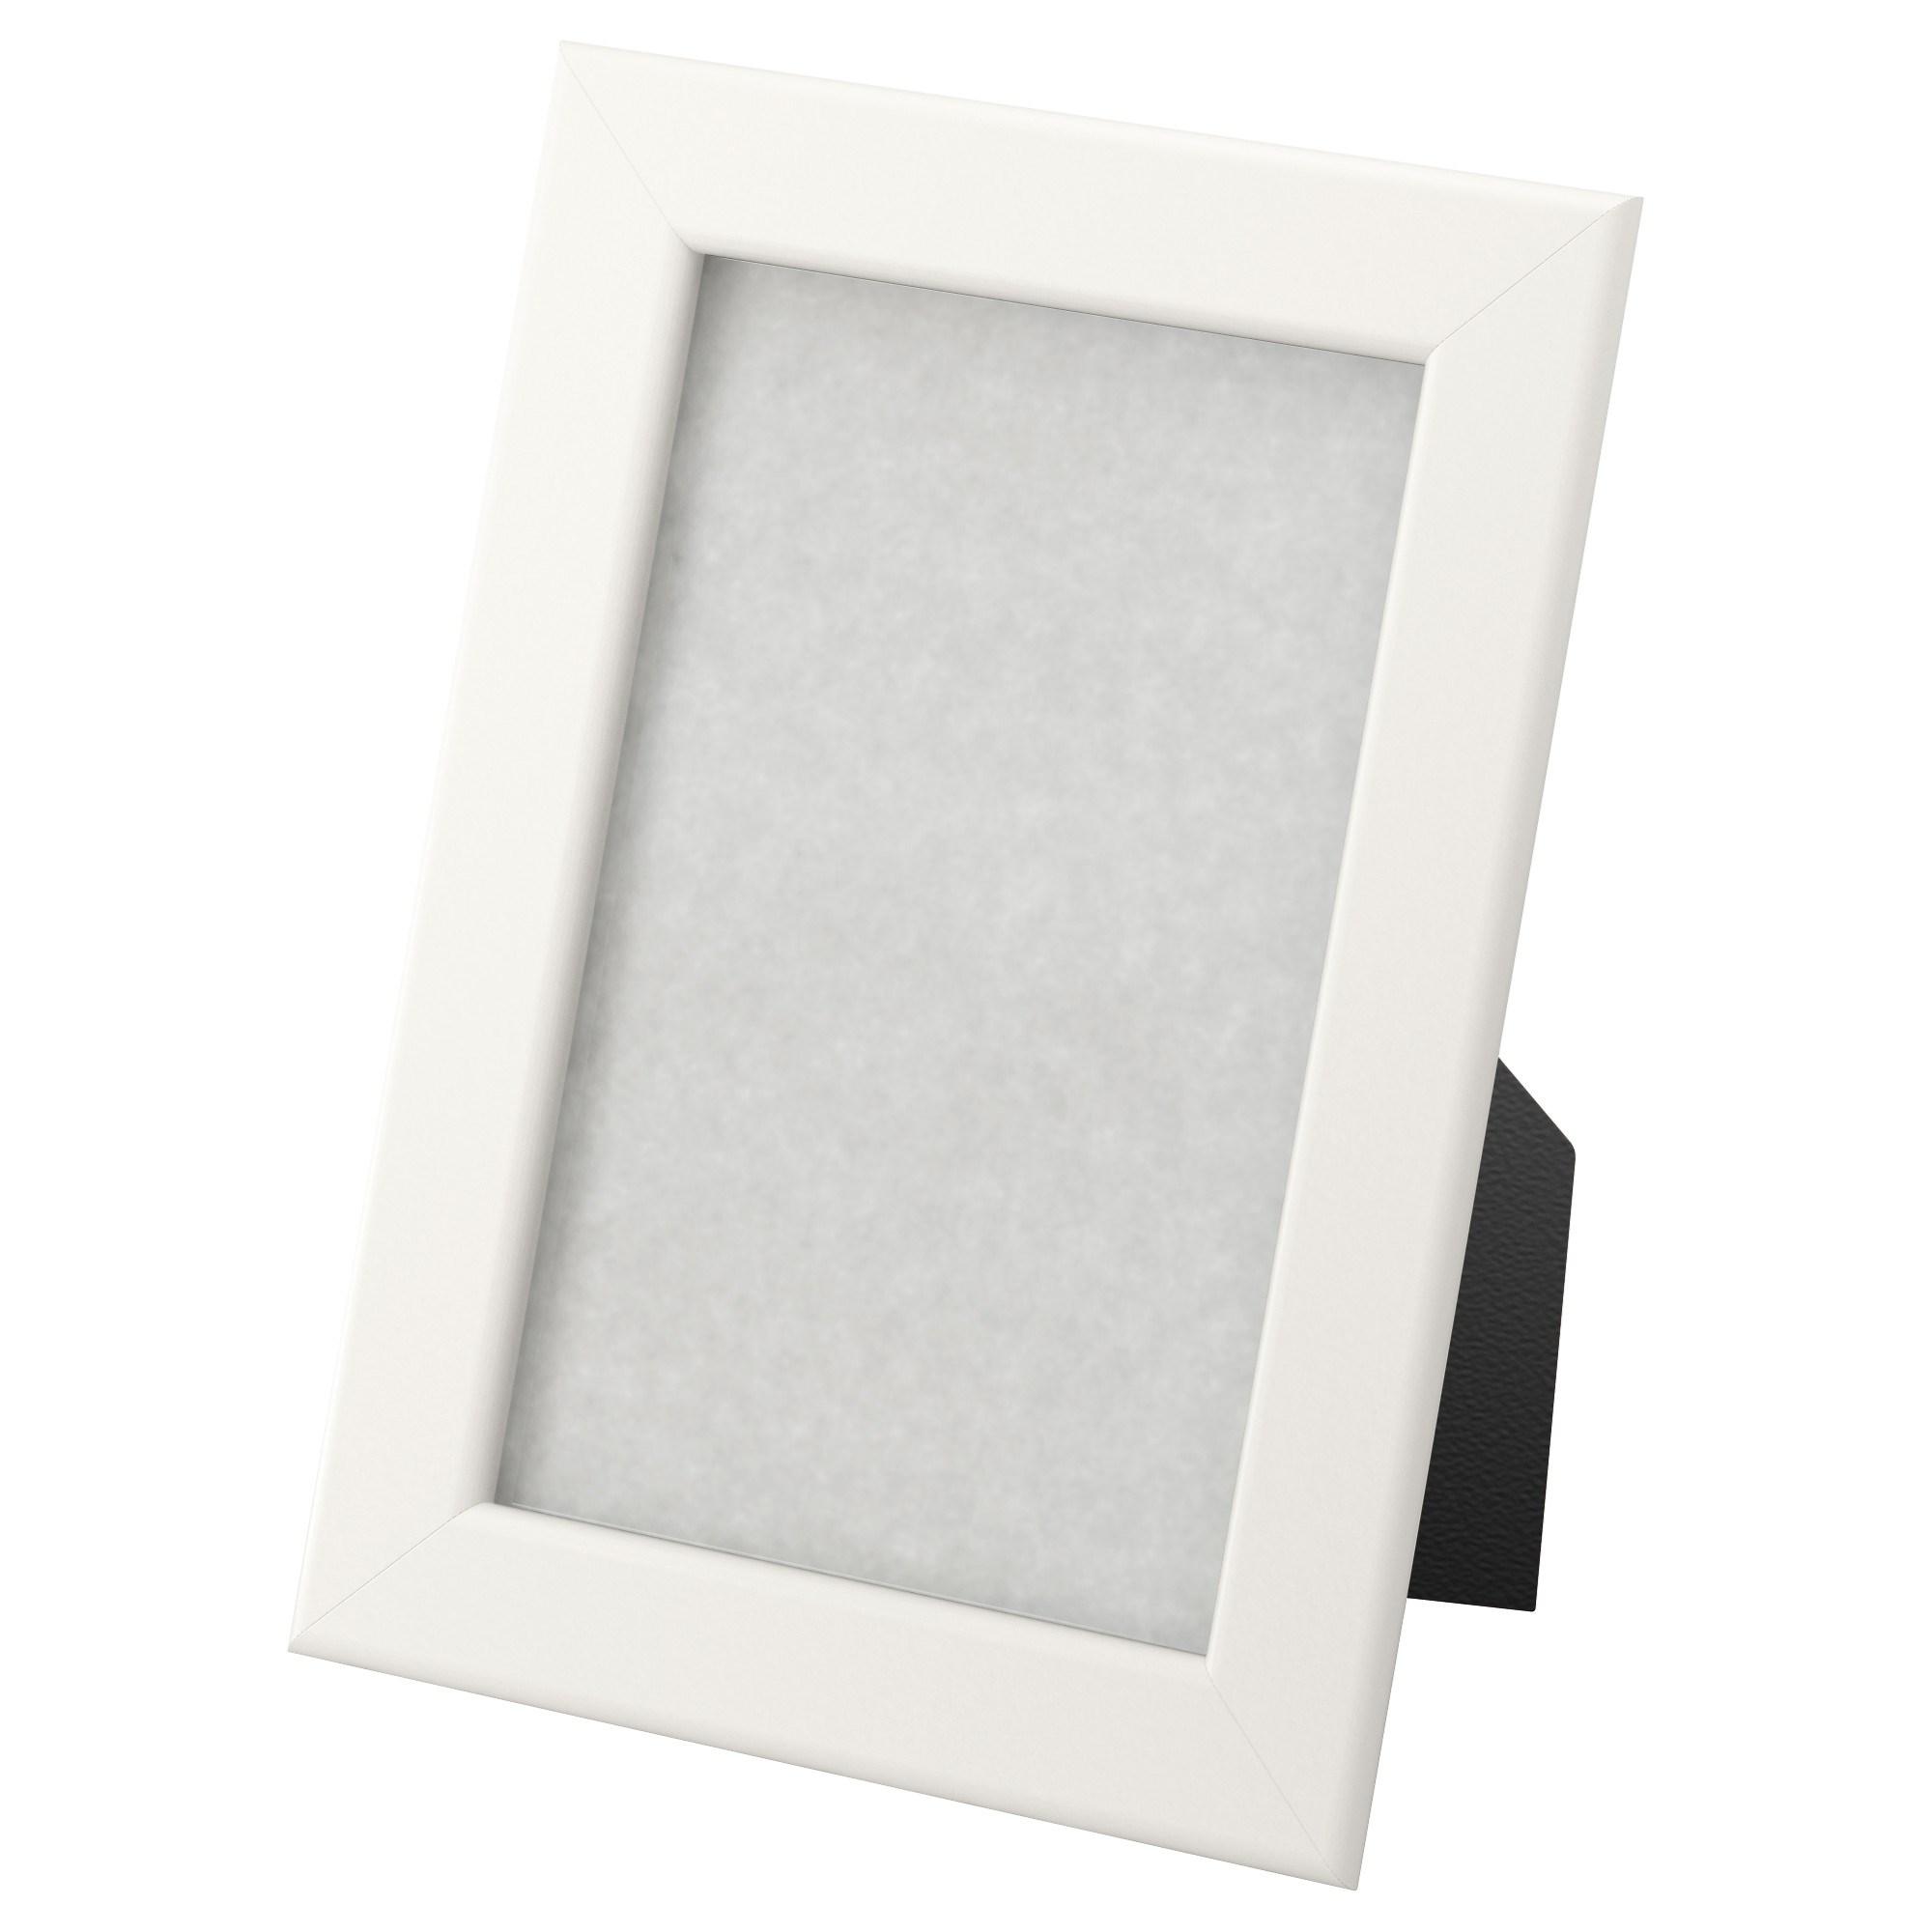 FISKBO photo frame white 10x15 cm | IKEA Home Decoration